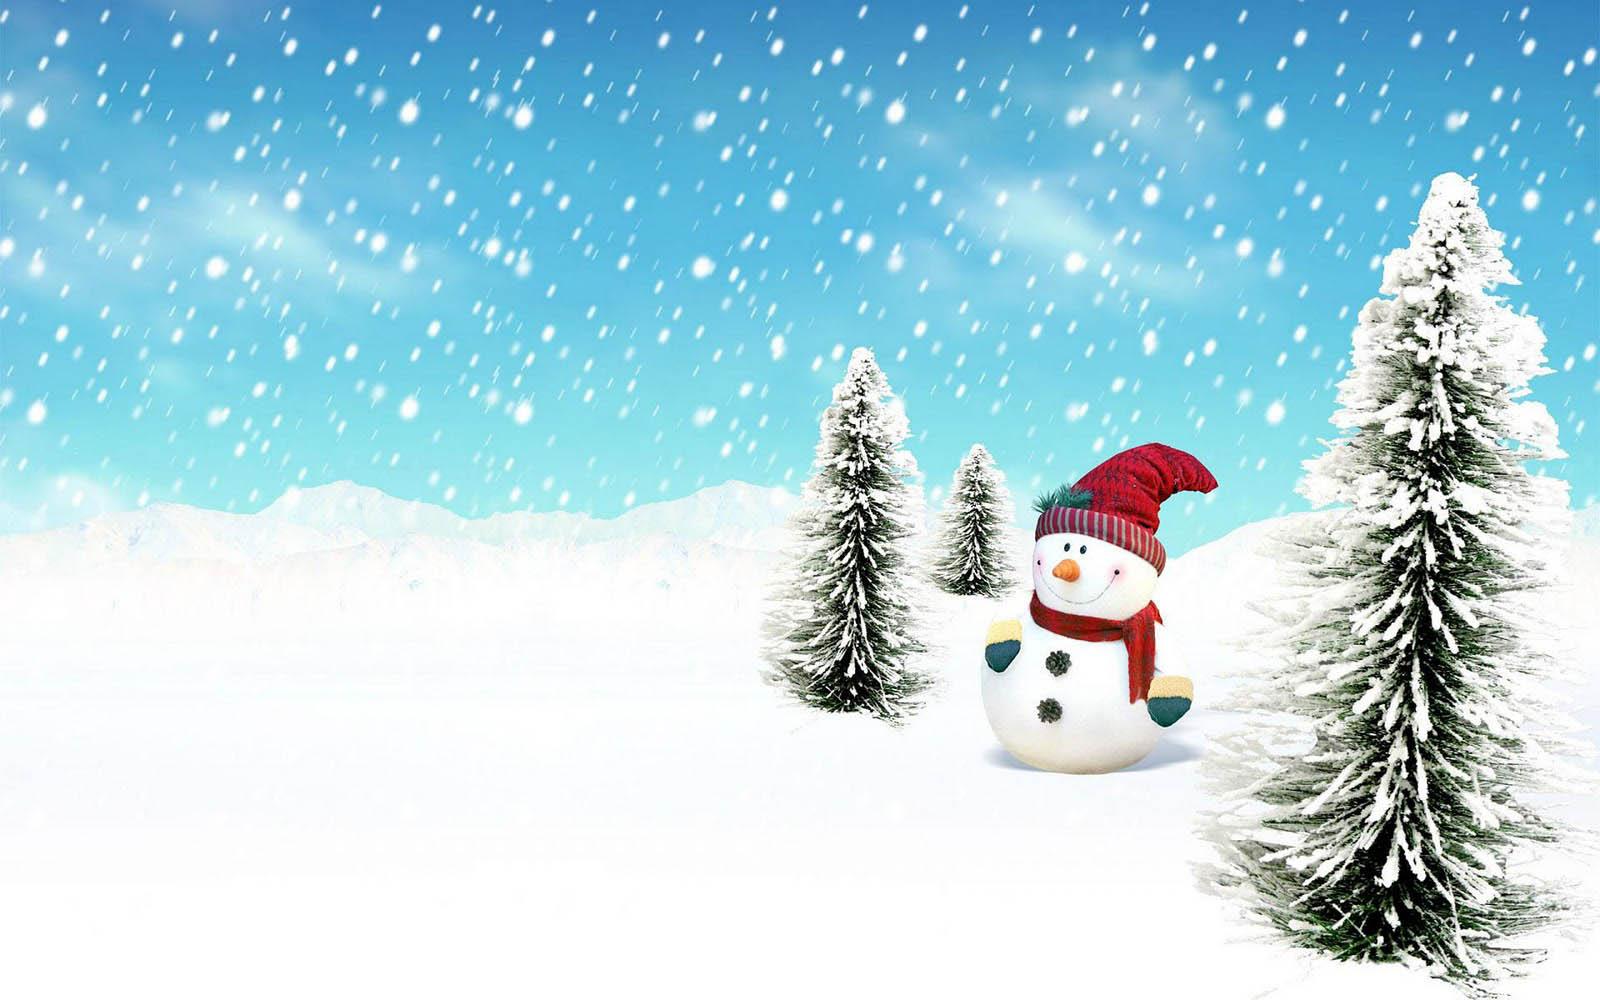 48 Free Snowman Wallpaper Downloads On Wallpapersafari